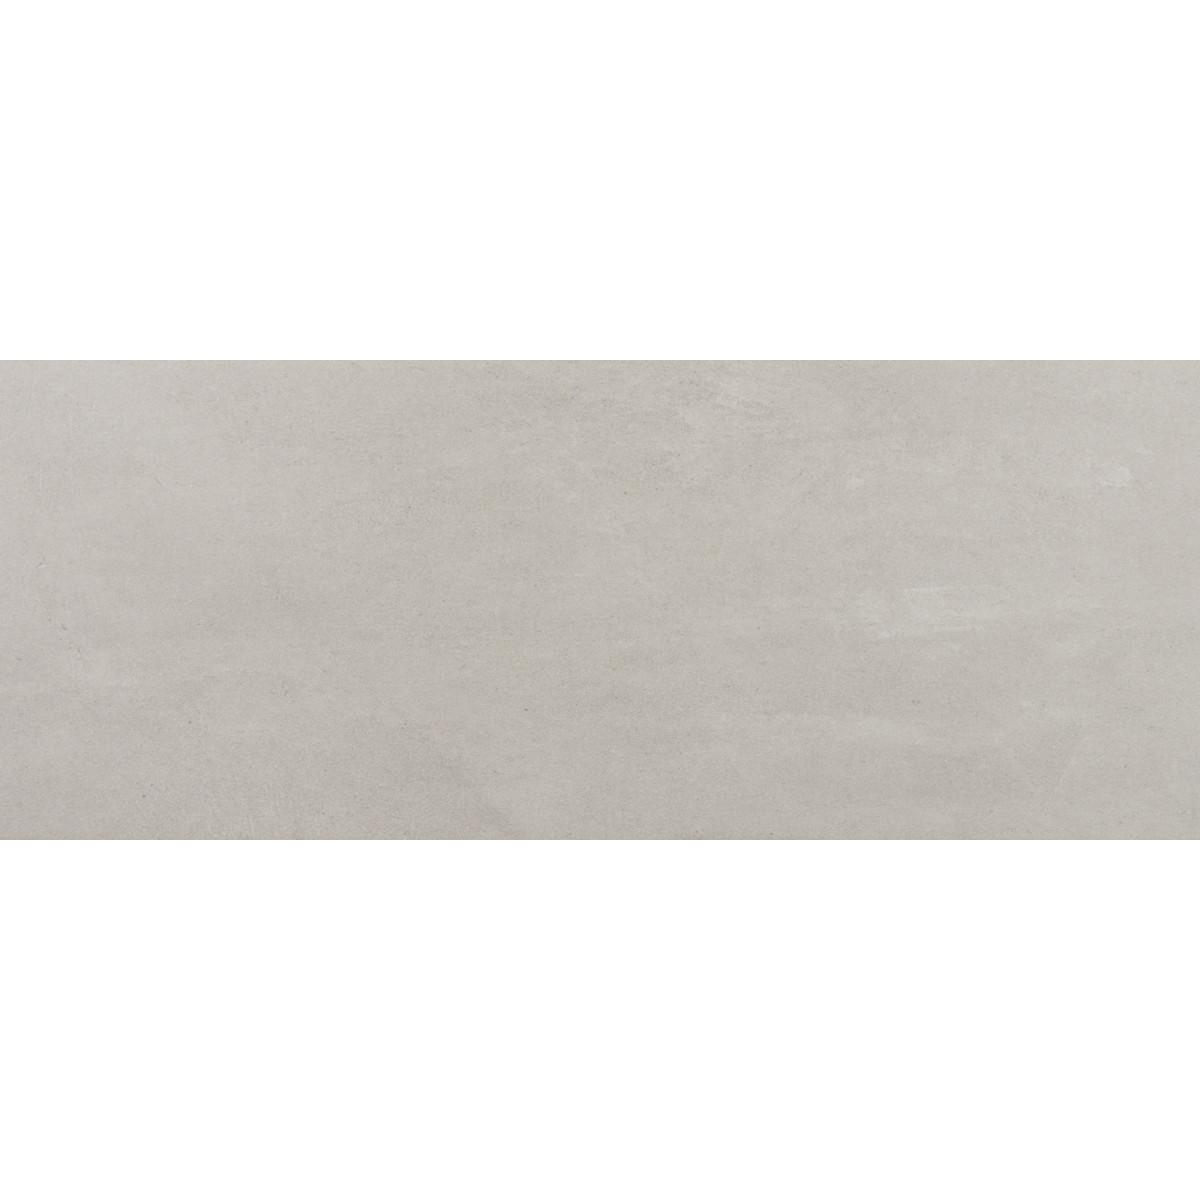 Плитка настенная Osaka 20x50 см 1.3 м² цвет темно-серый